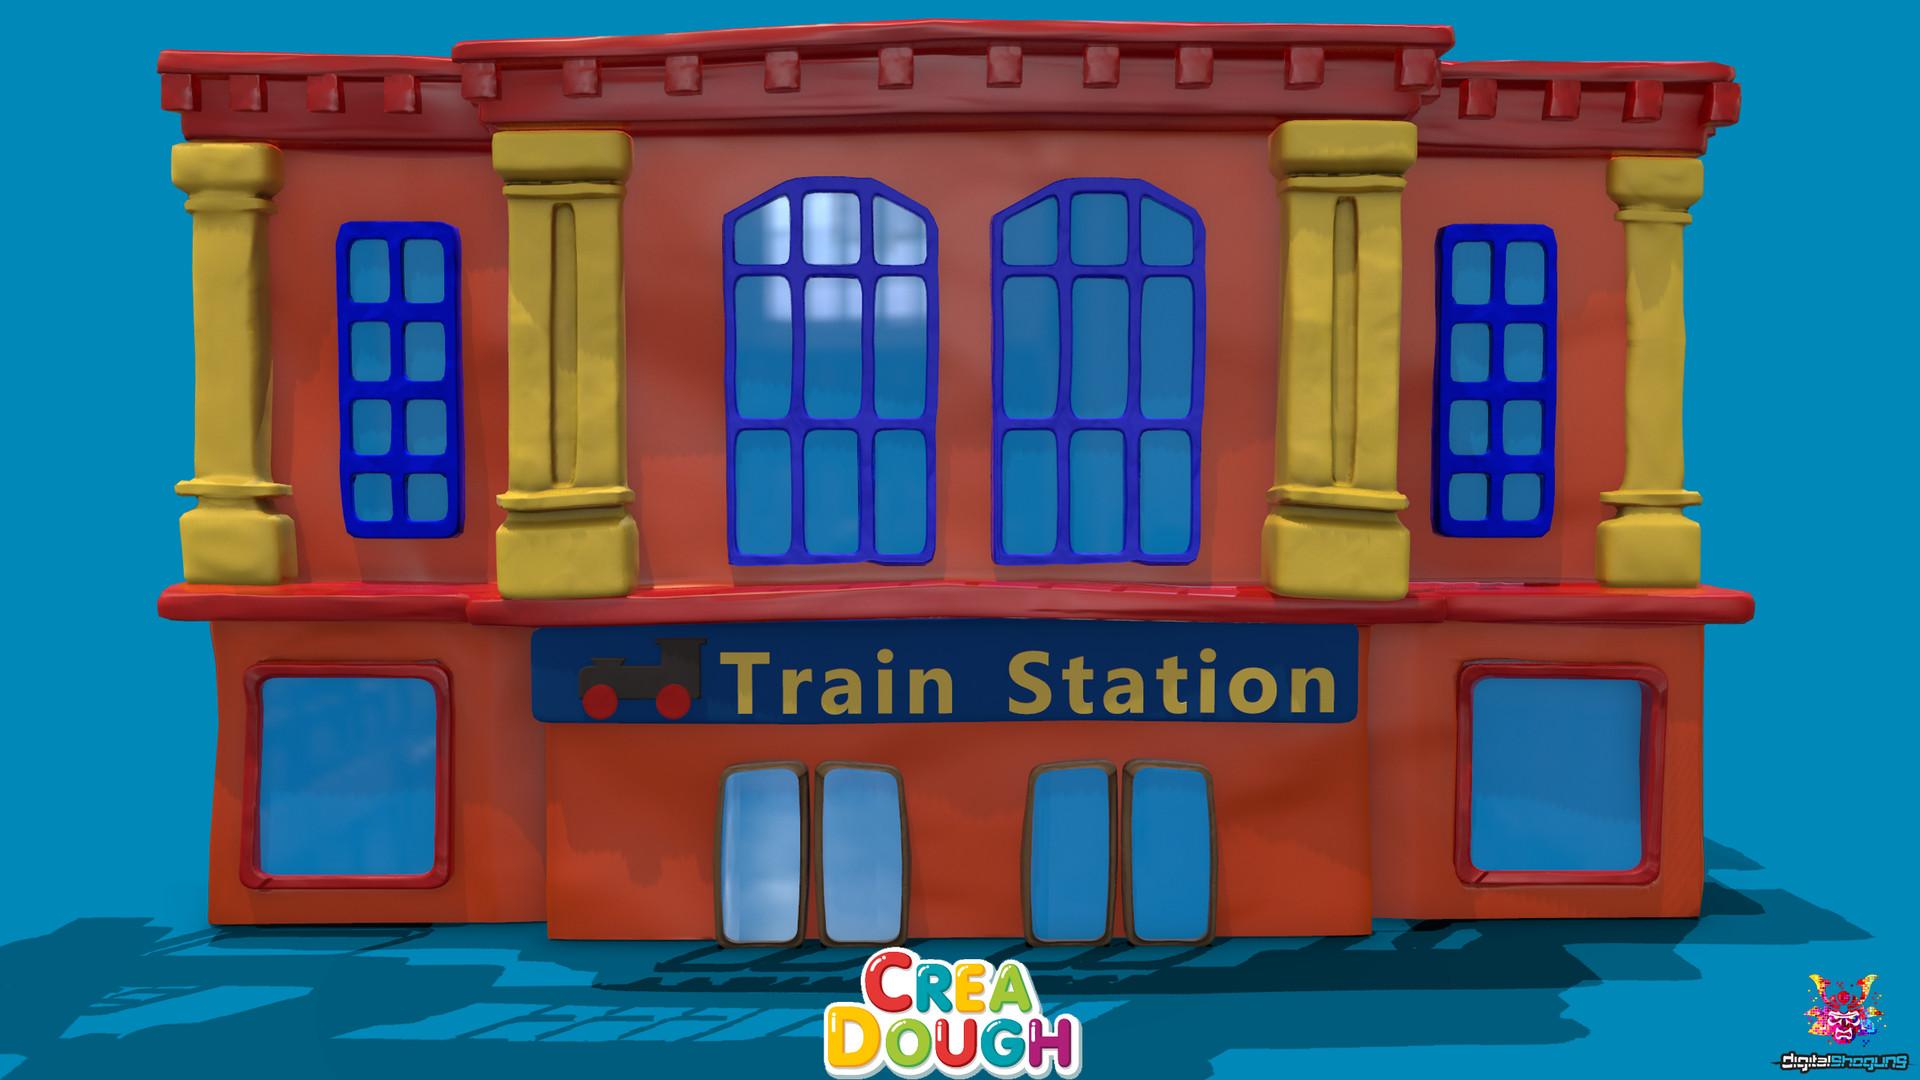 Martin giles train station 001